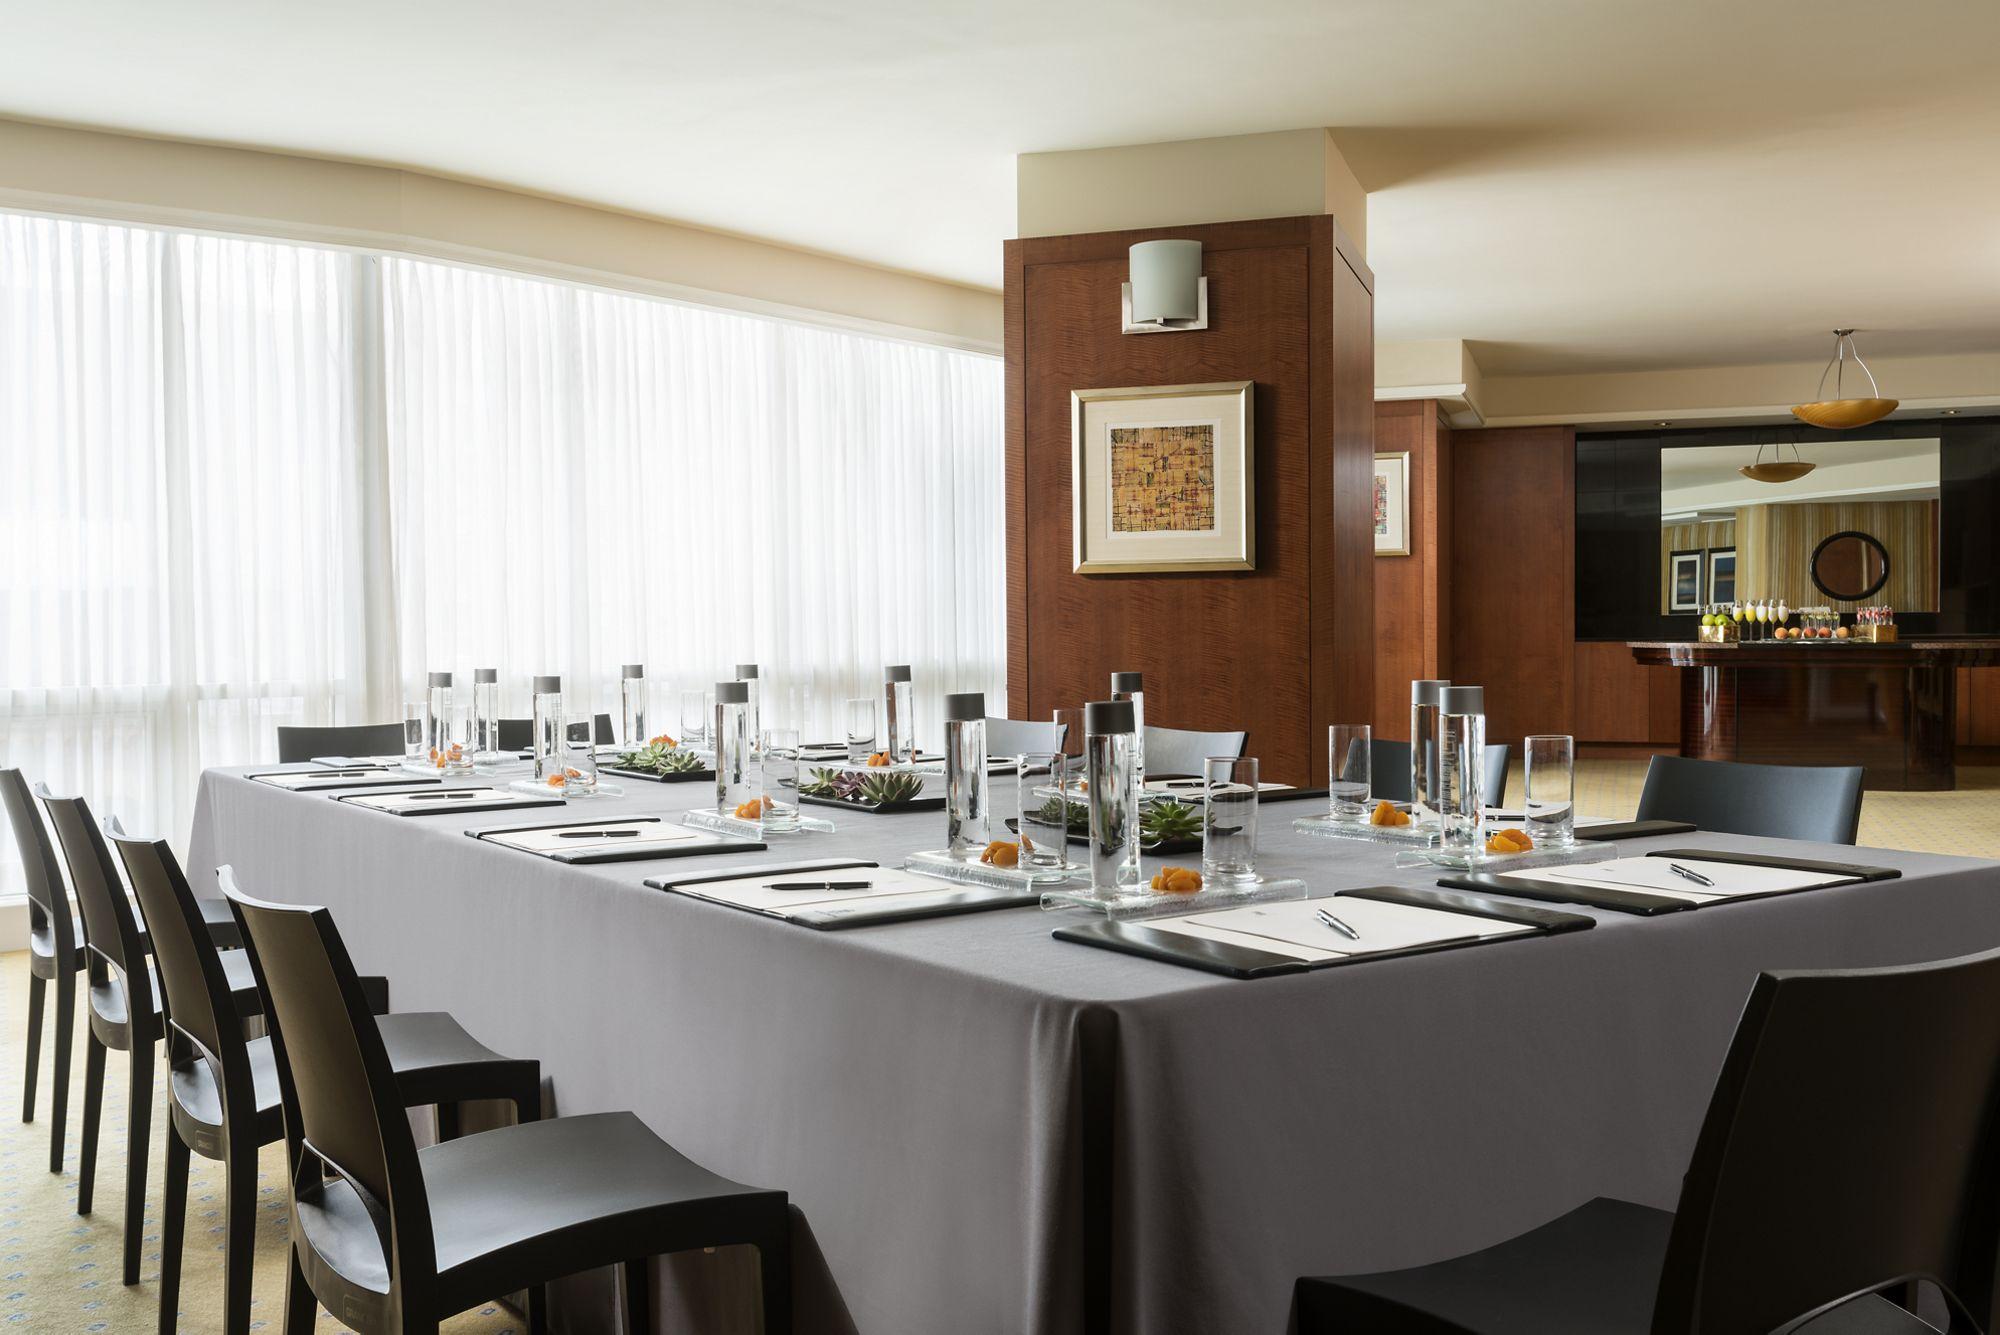 The Ritz-Carlton New York, Westchester image 5